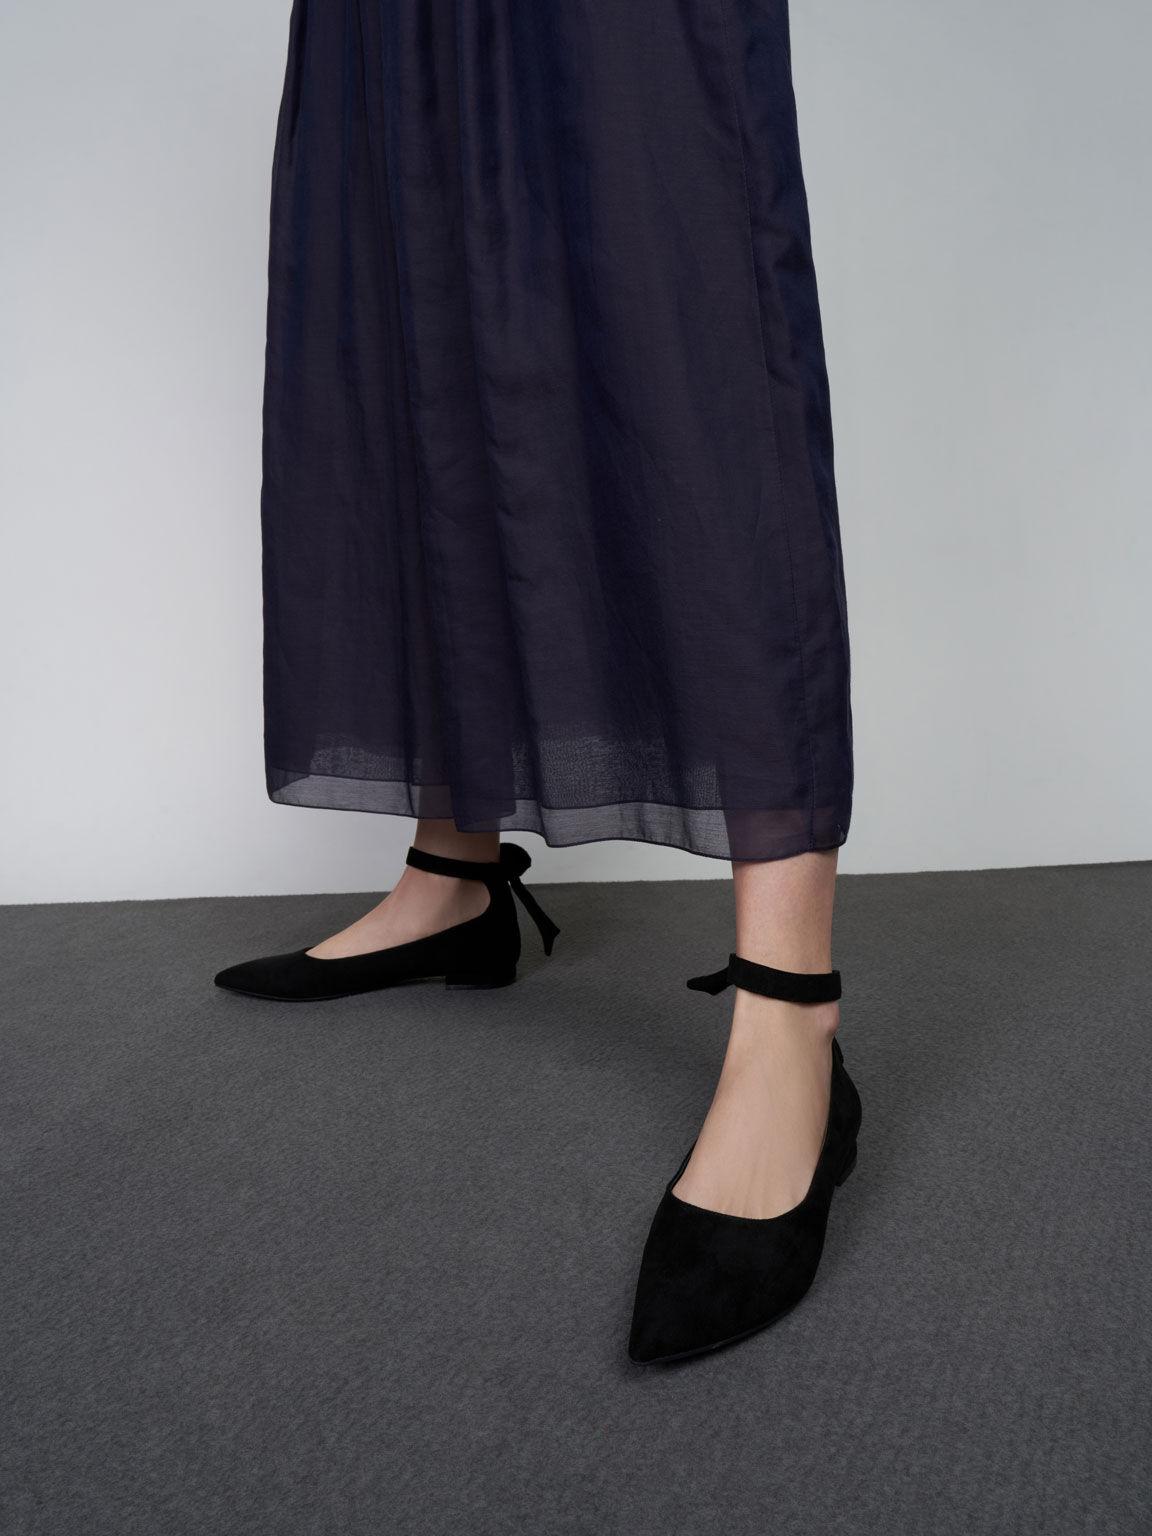 Textured Ankle Strap Ballerina Flats, Black, hi-res